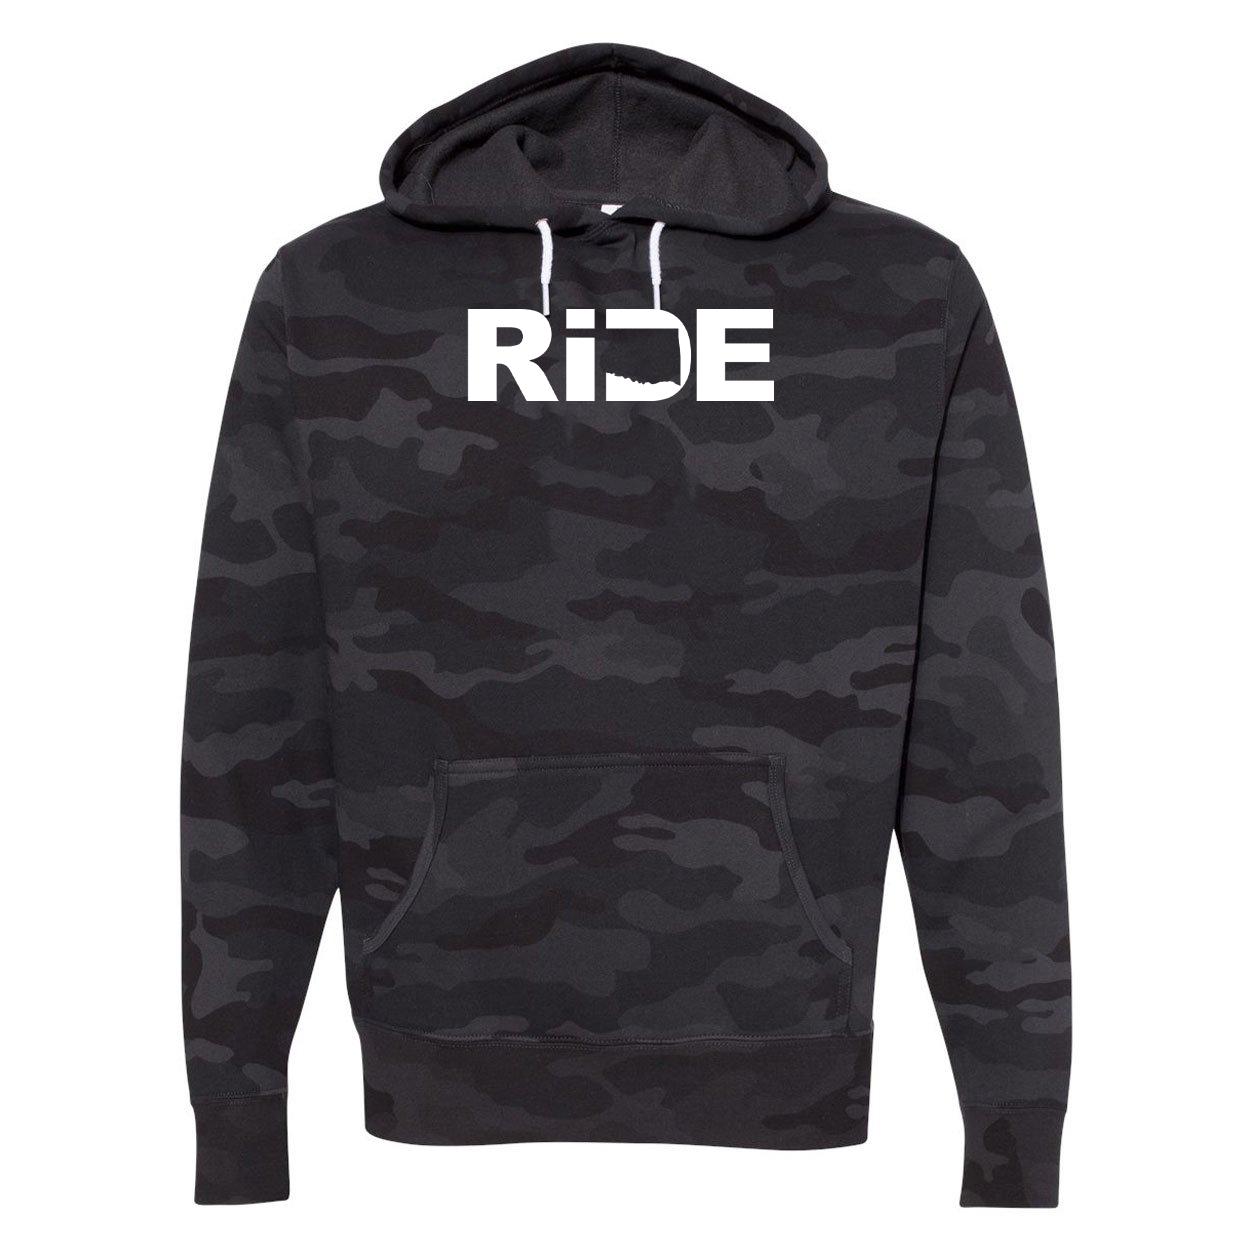 Ride Oklahoma Classic Unisex Hooded Sweatshirt Black Camo (White Logo)